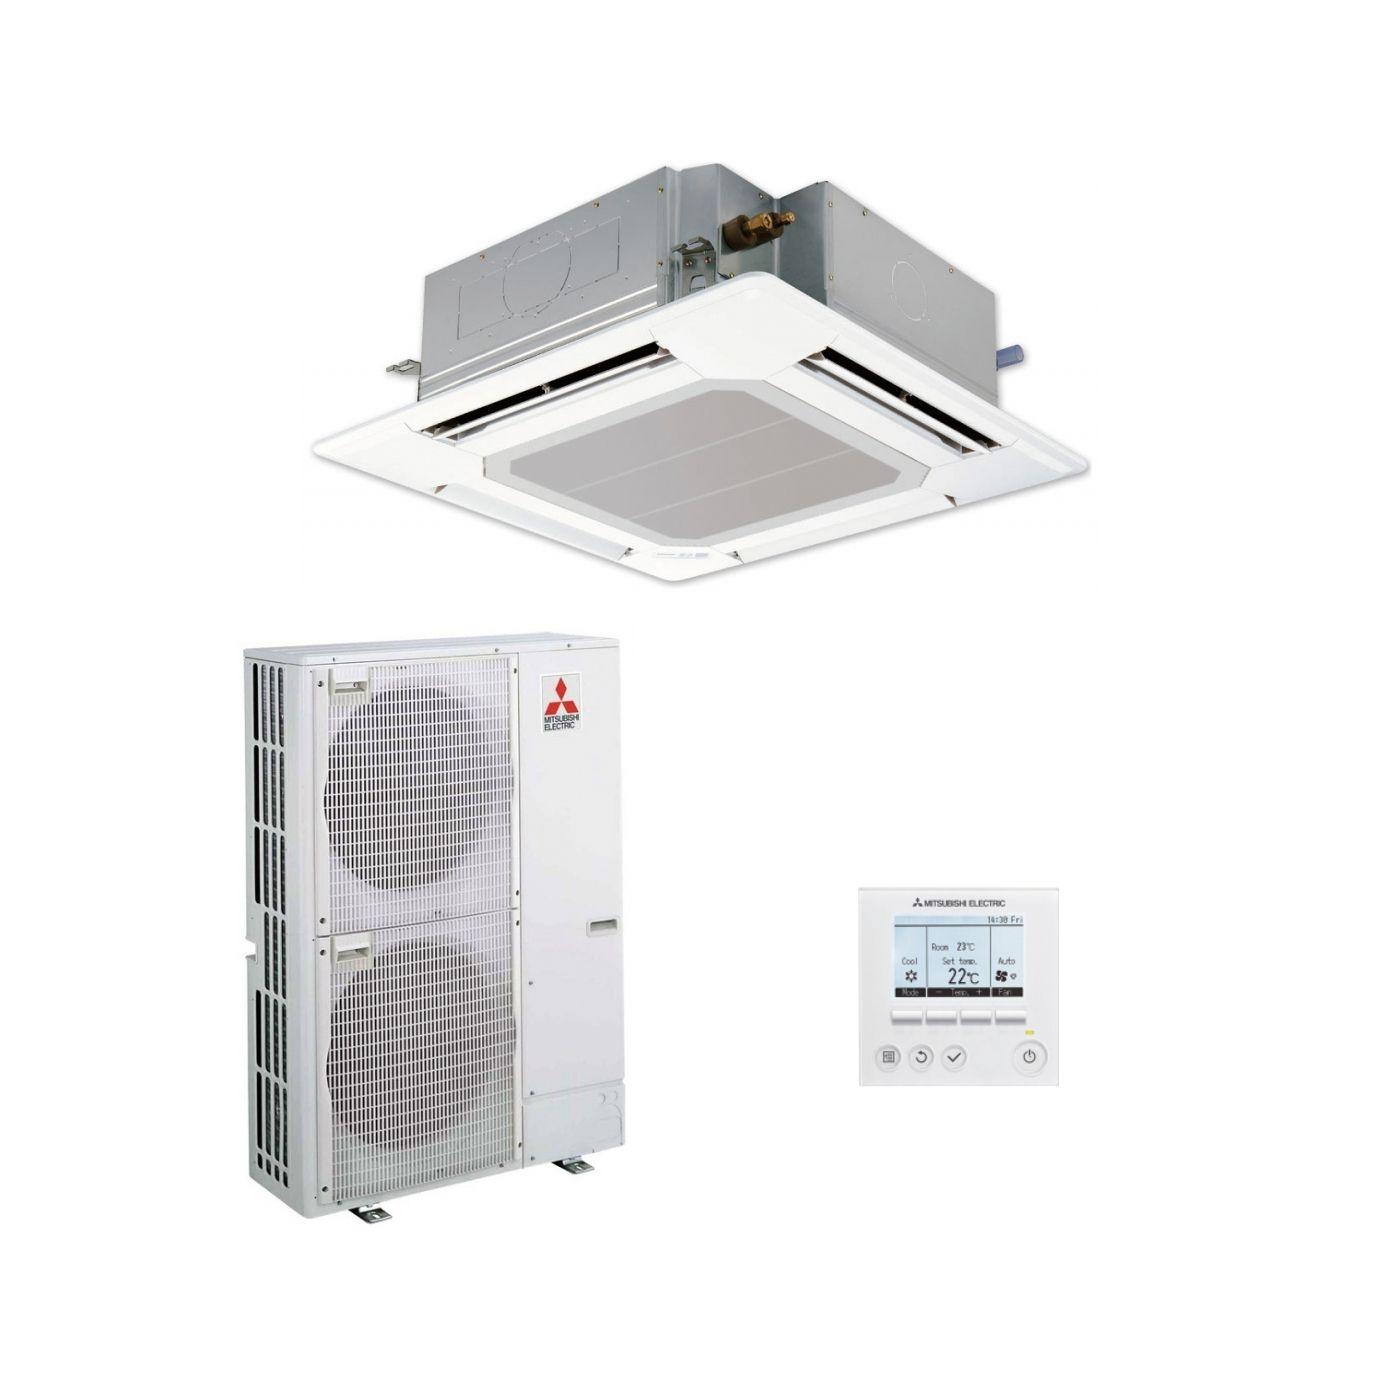 Mitsubishi Electric Air Conditioning Cassette PLA-ZM125EA Power Inverter  Heat Pump 12.5Kw/42000Btu R32 A++ 240V/415V~50Hz